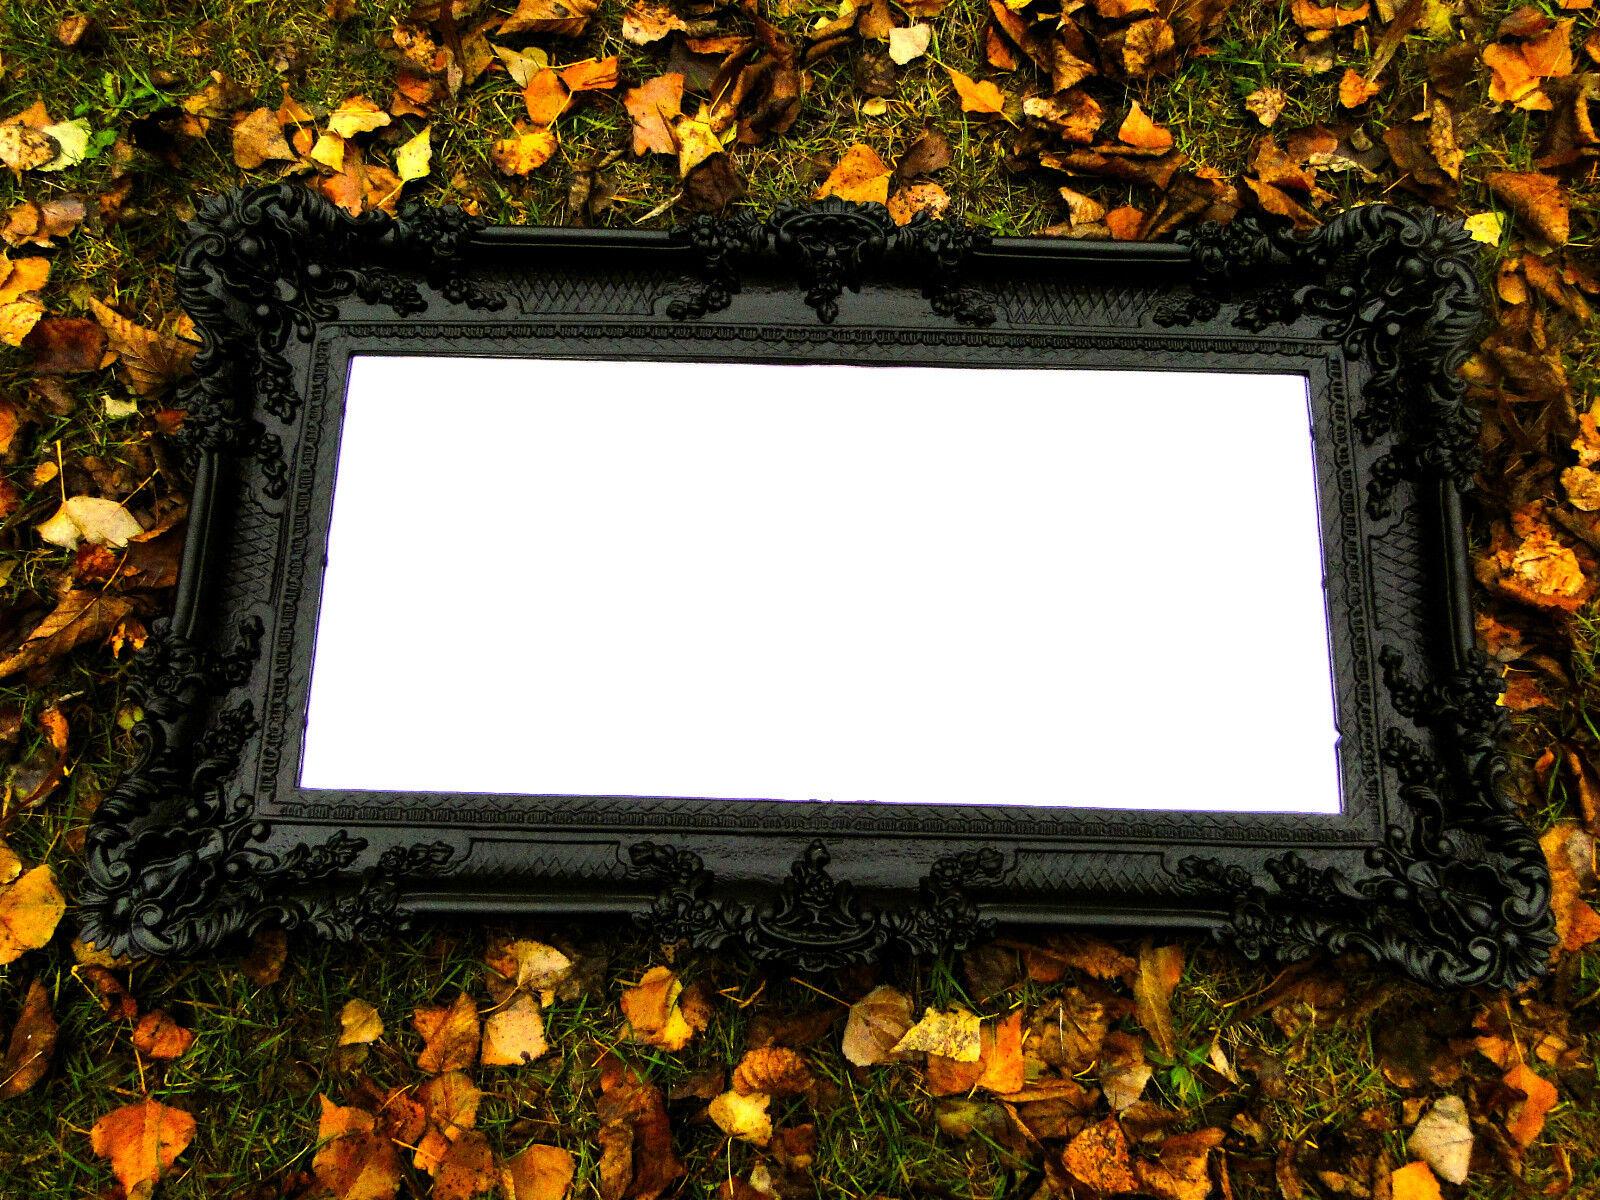 Ebay - Barock spiegel schwarz ...